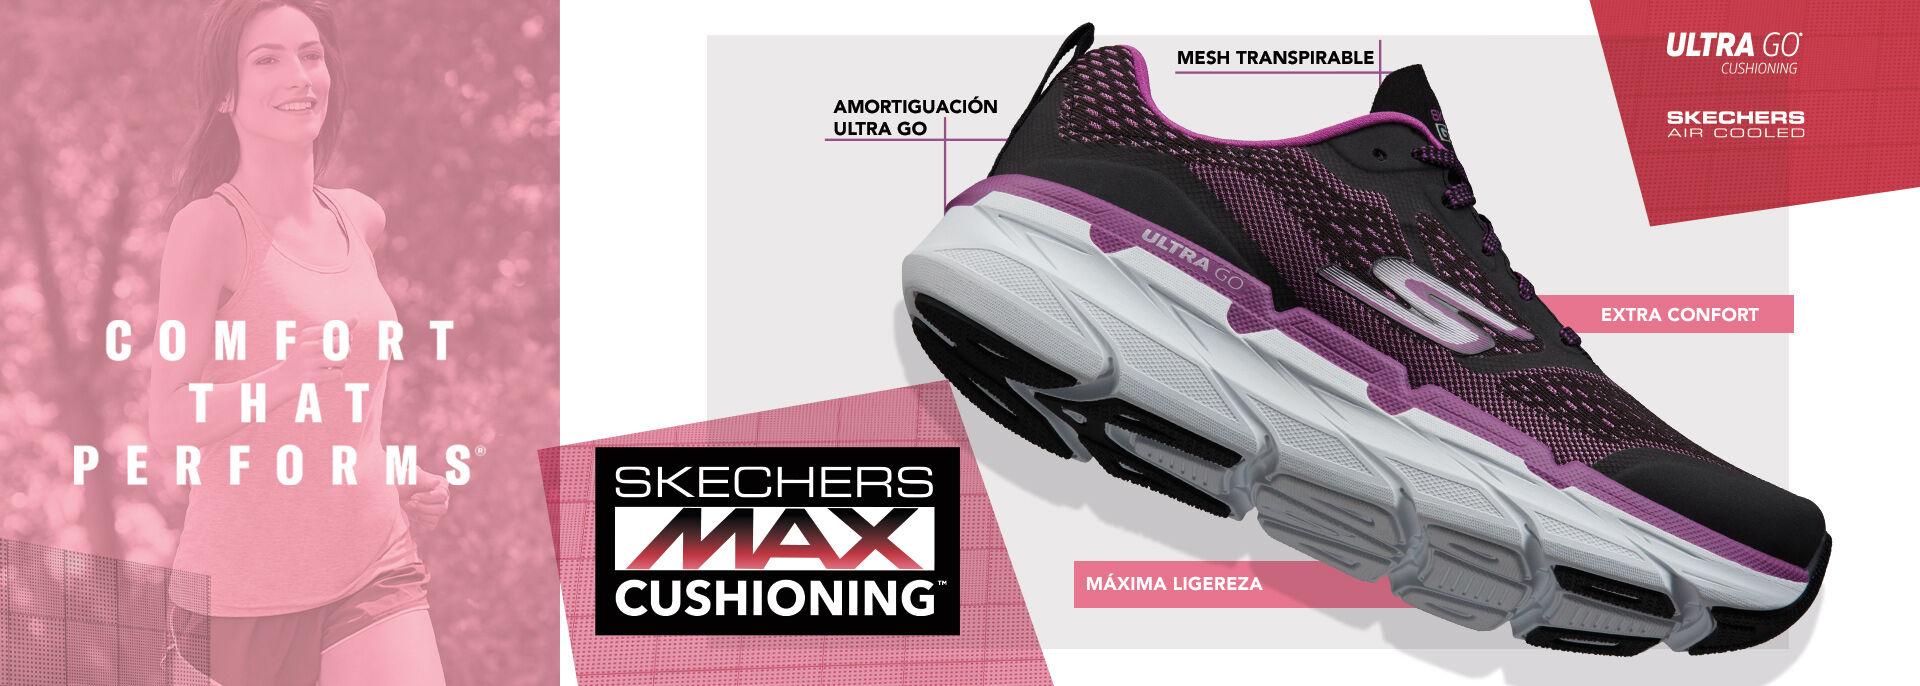 mesrosa_octubre_maxcushioning_skechers_1920X686.jpg